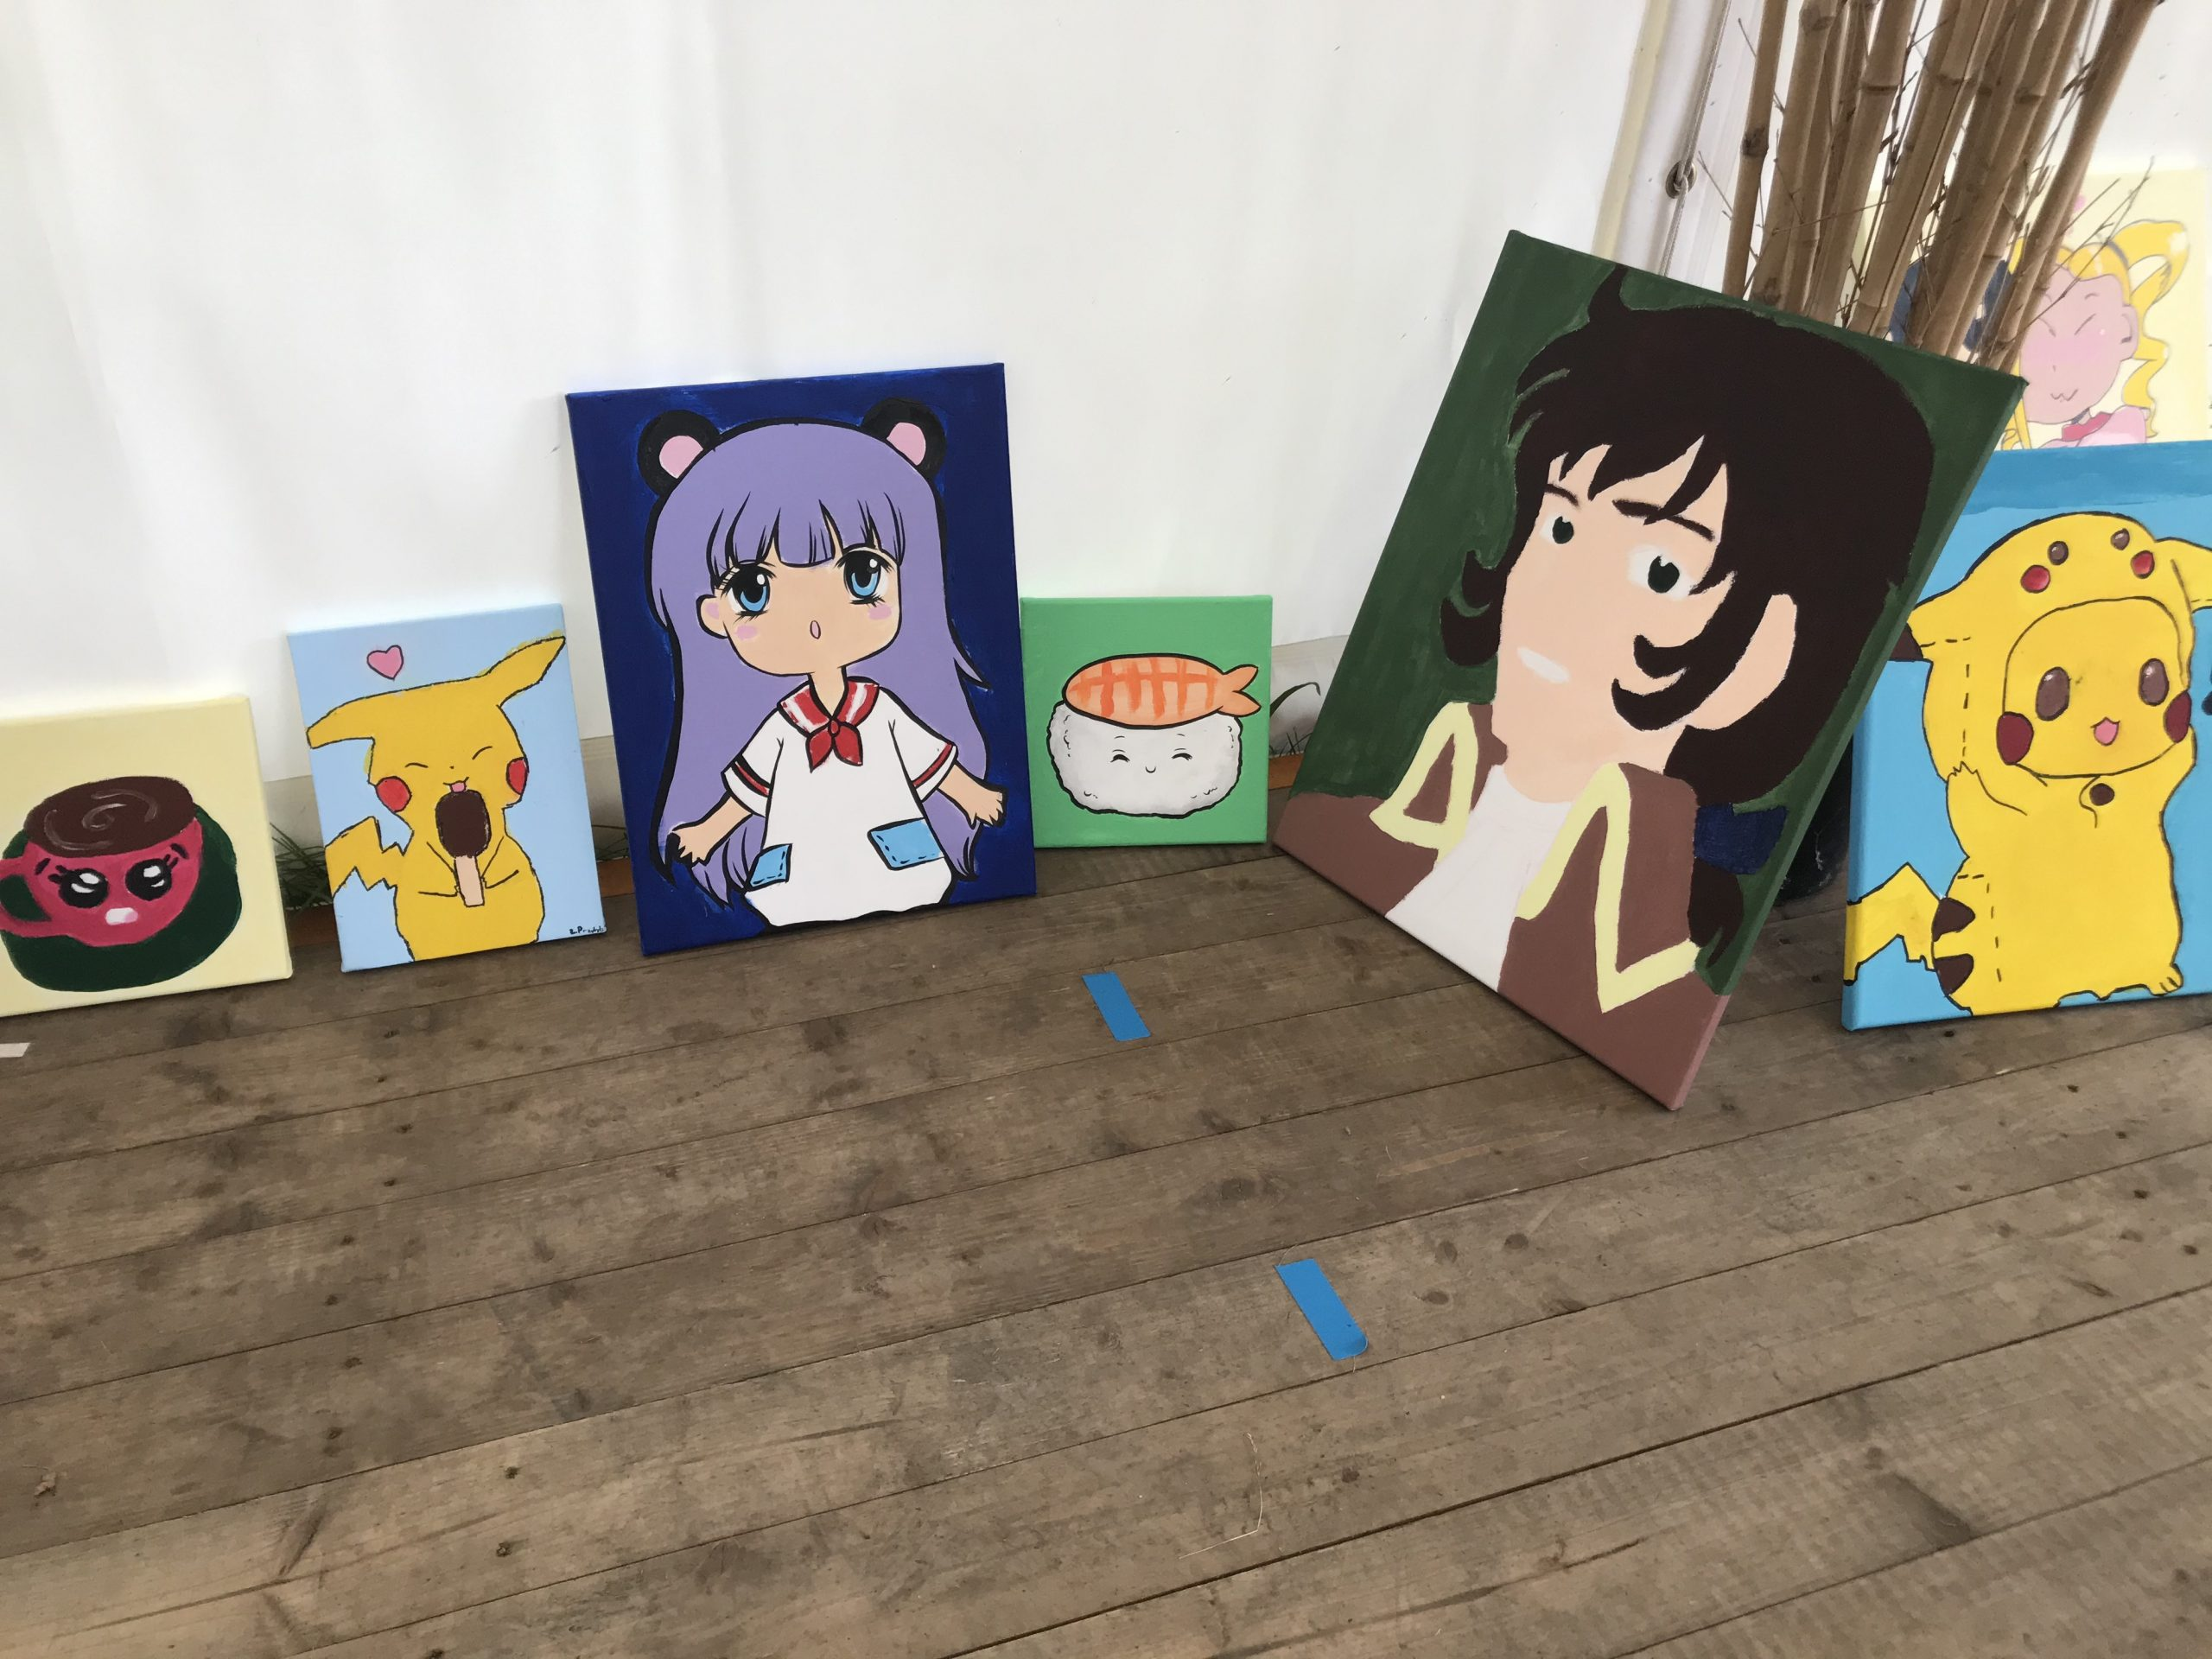 jugendkulturjahr-ratingen-2020-jkj-2020-manga